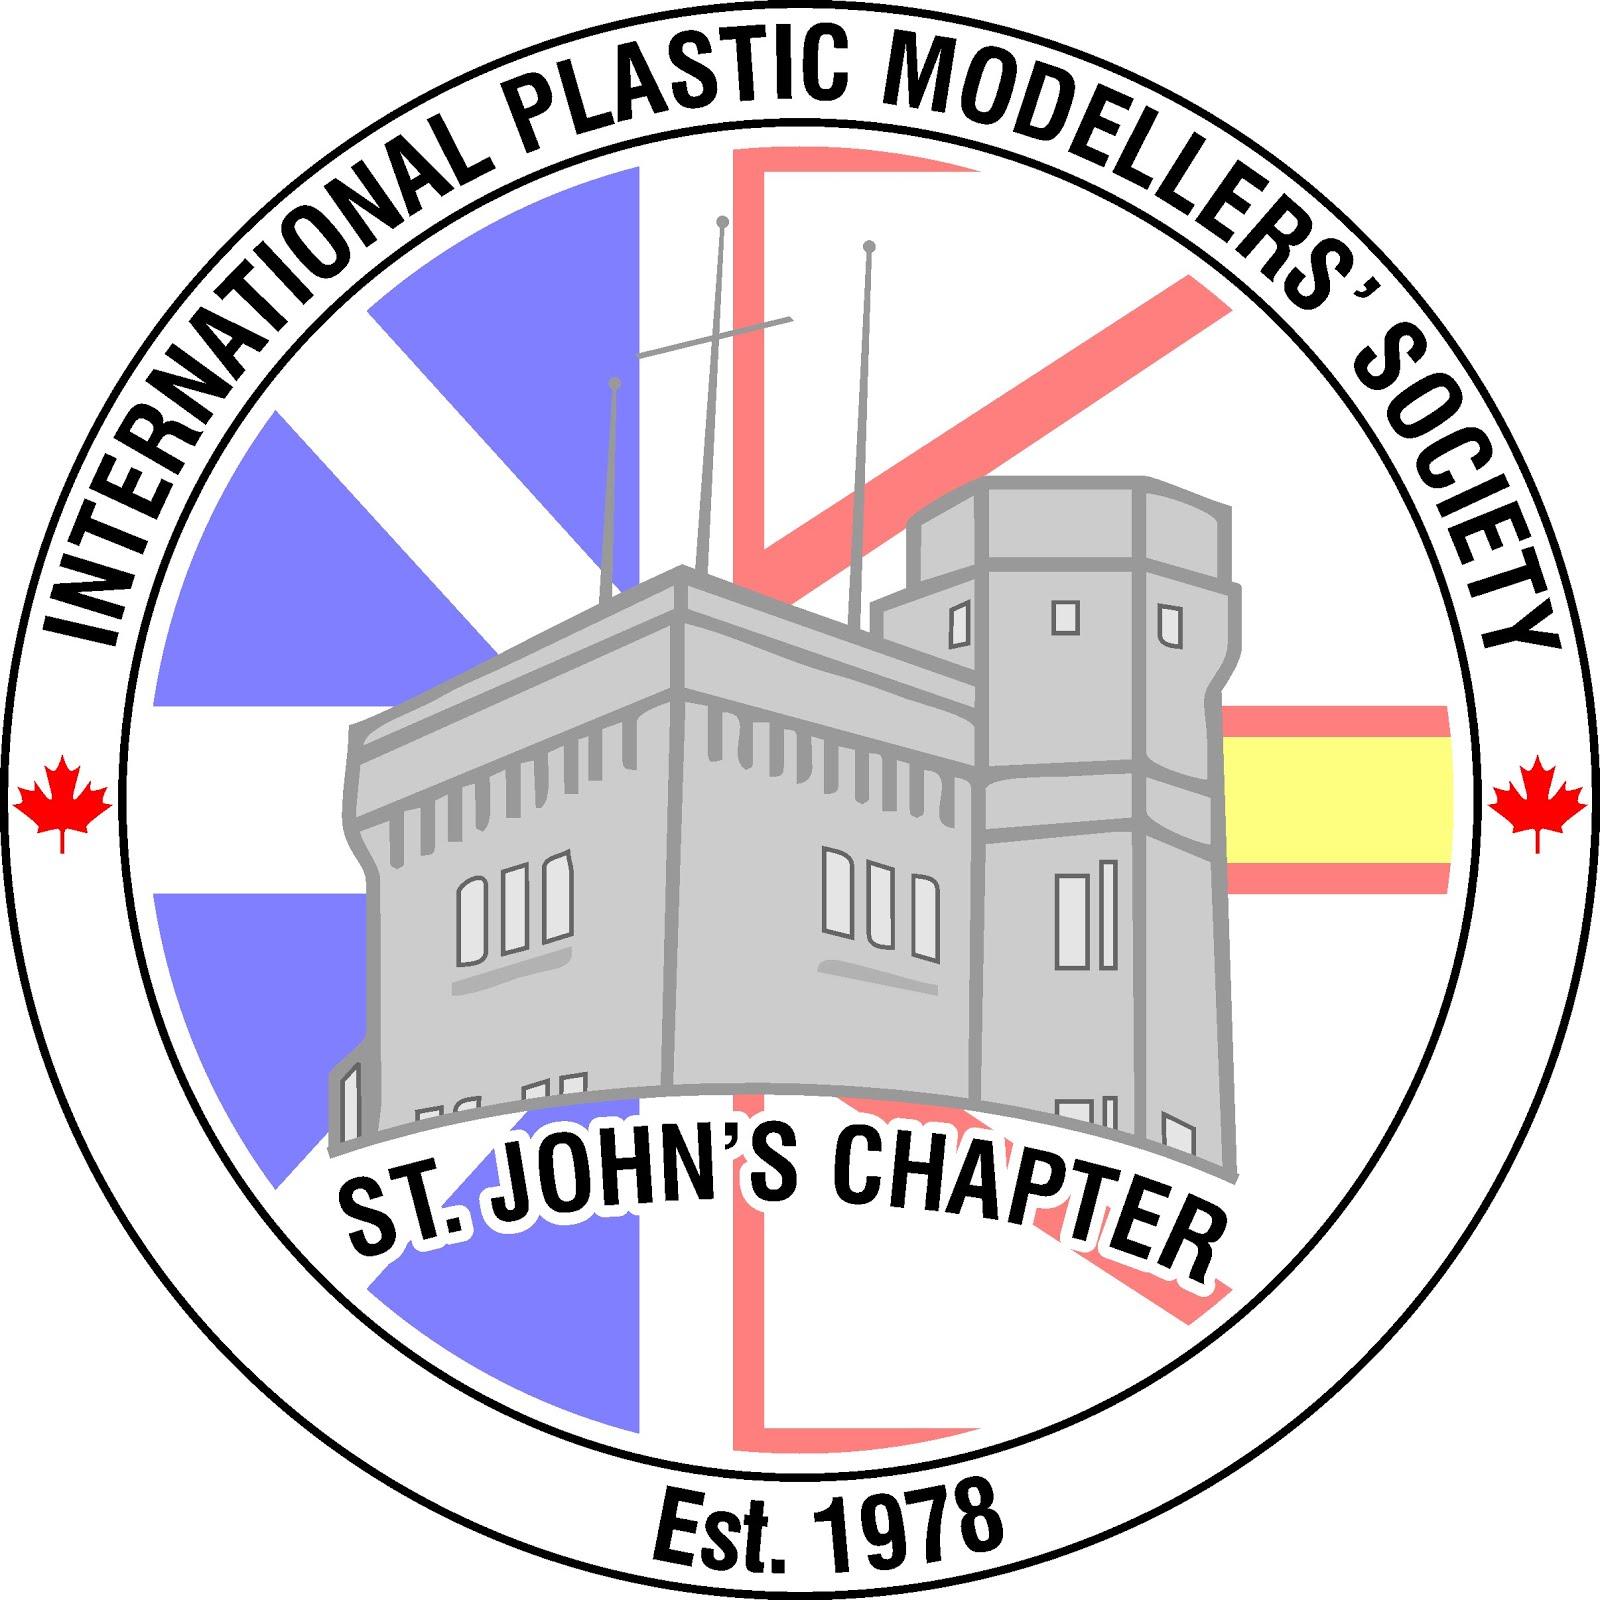 IPMS St. John's NL Chapter